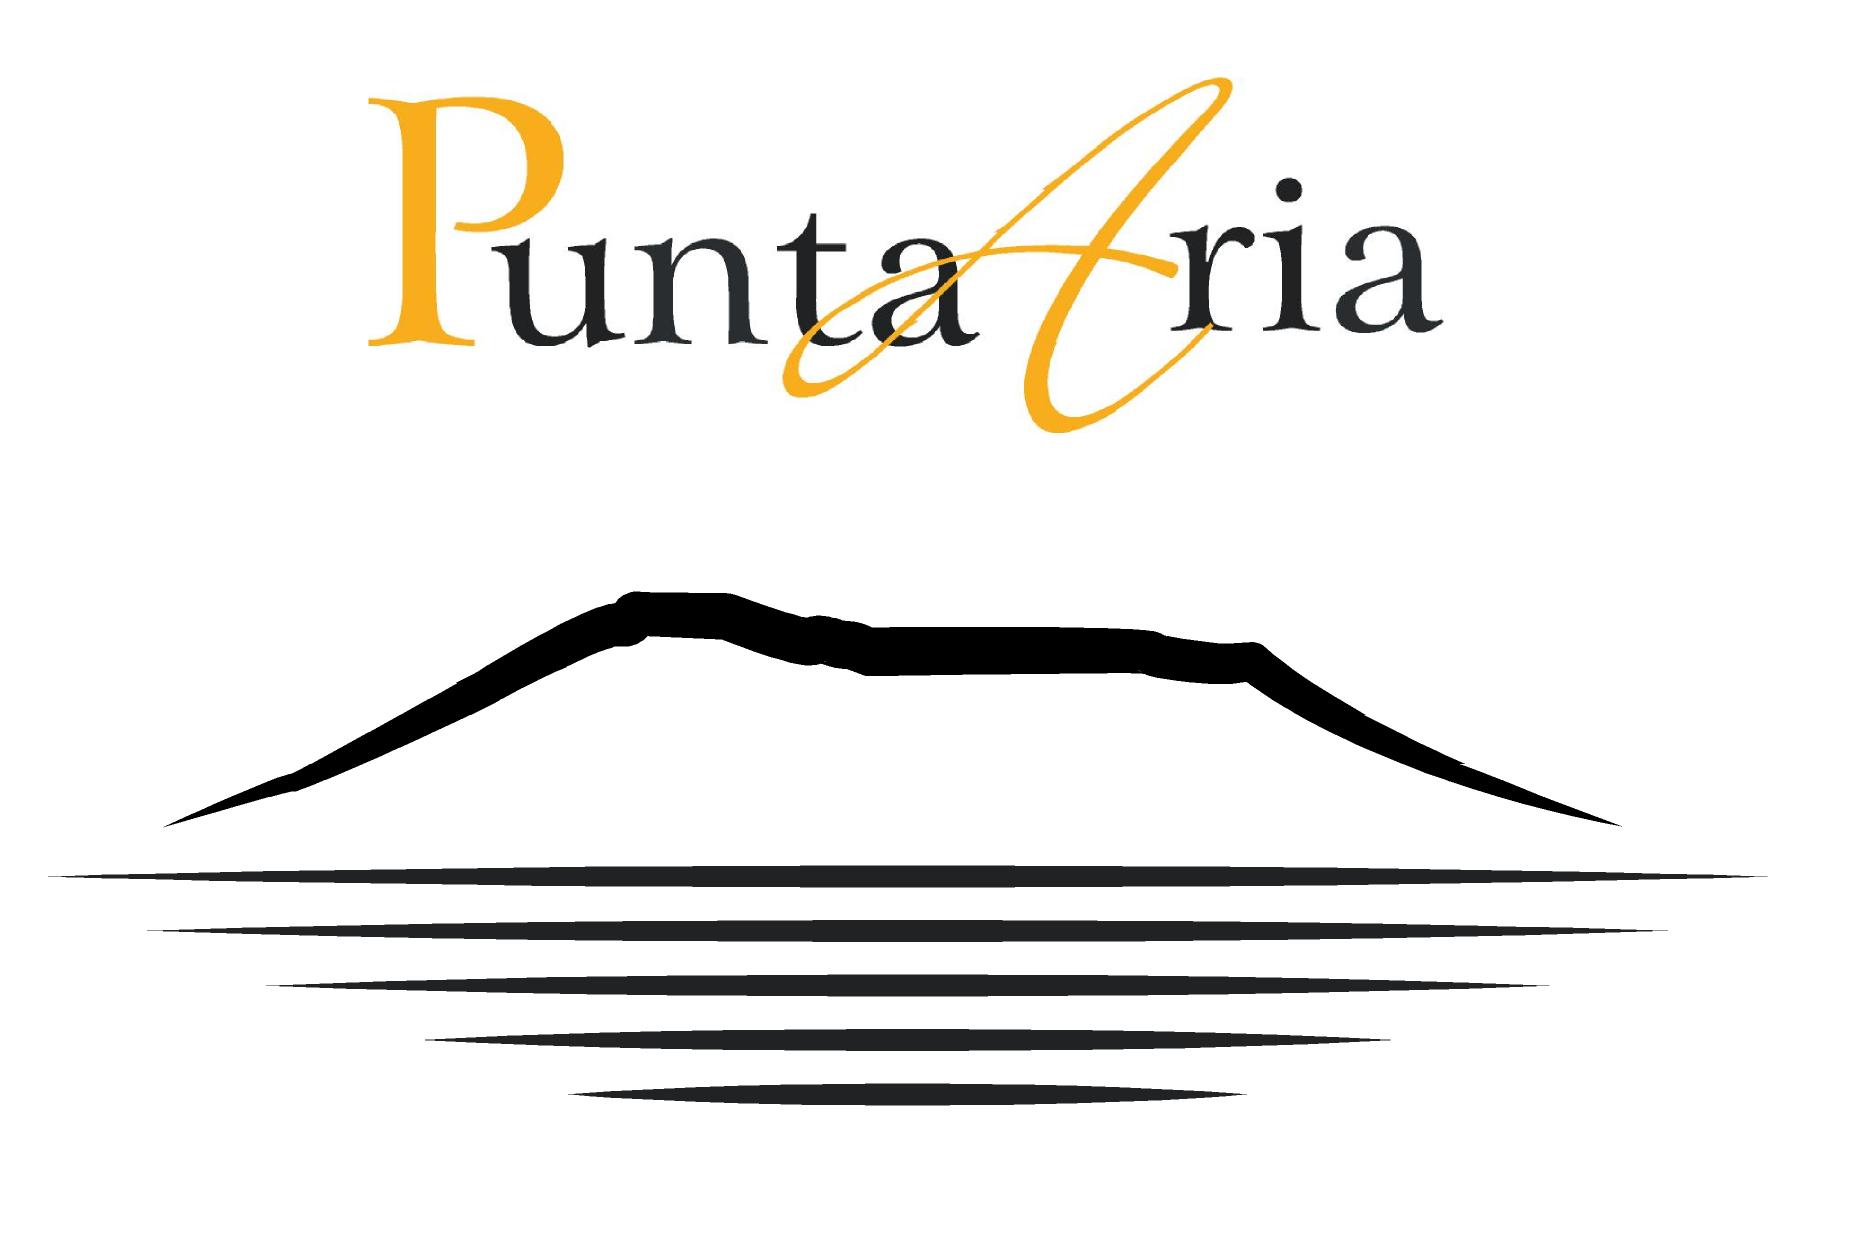 PUNTA ARIA